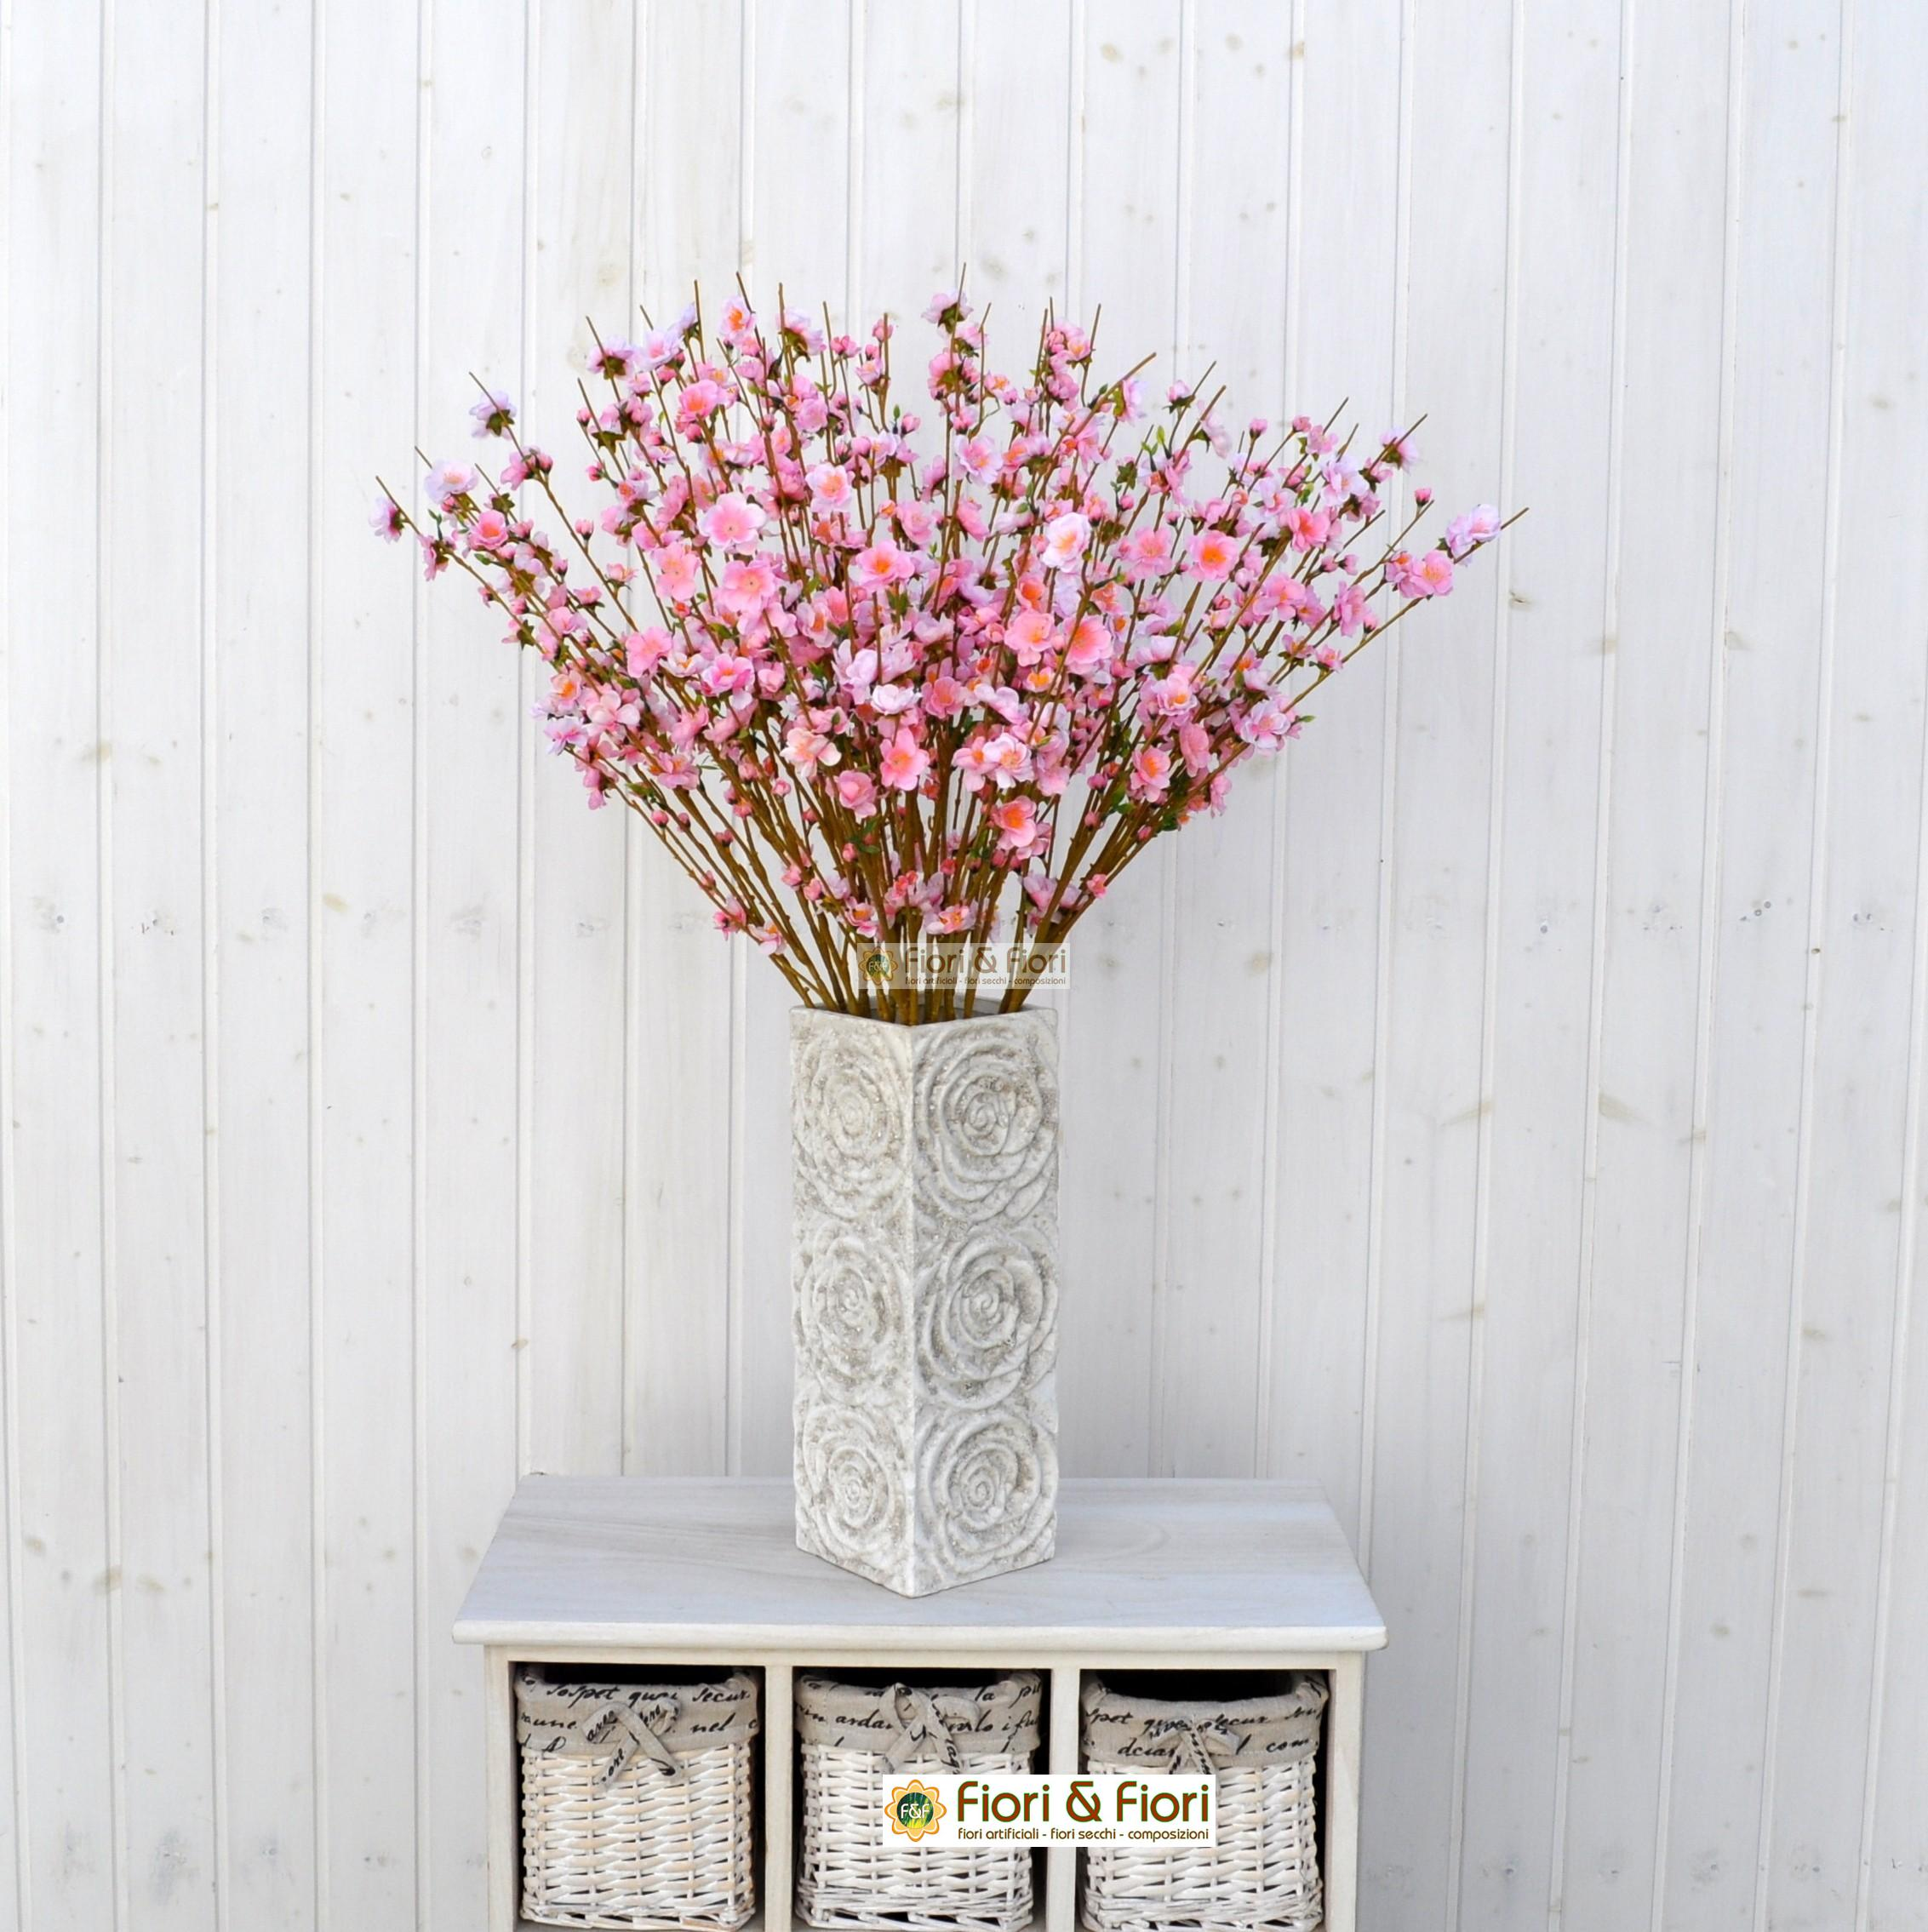 Rami Di Pesco Finti fiore di pesco rosa